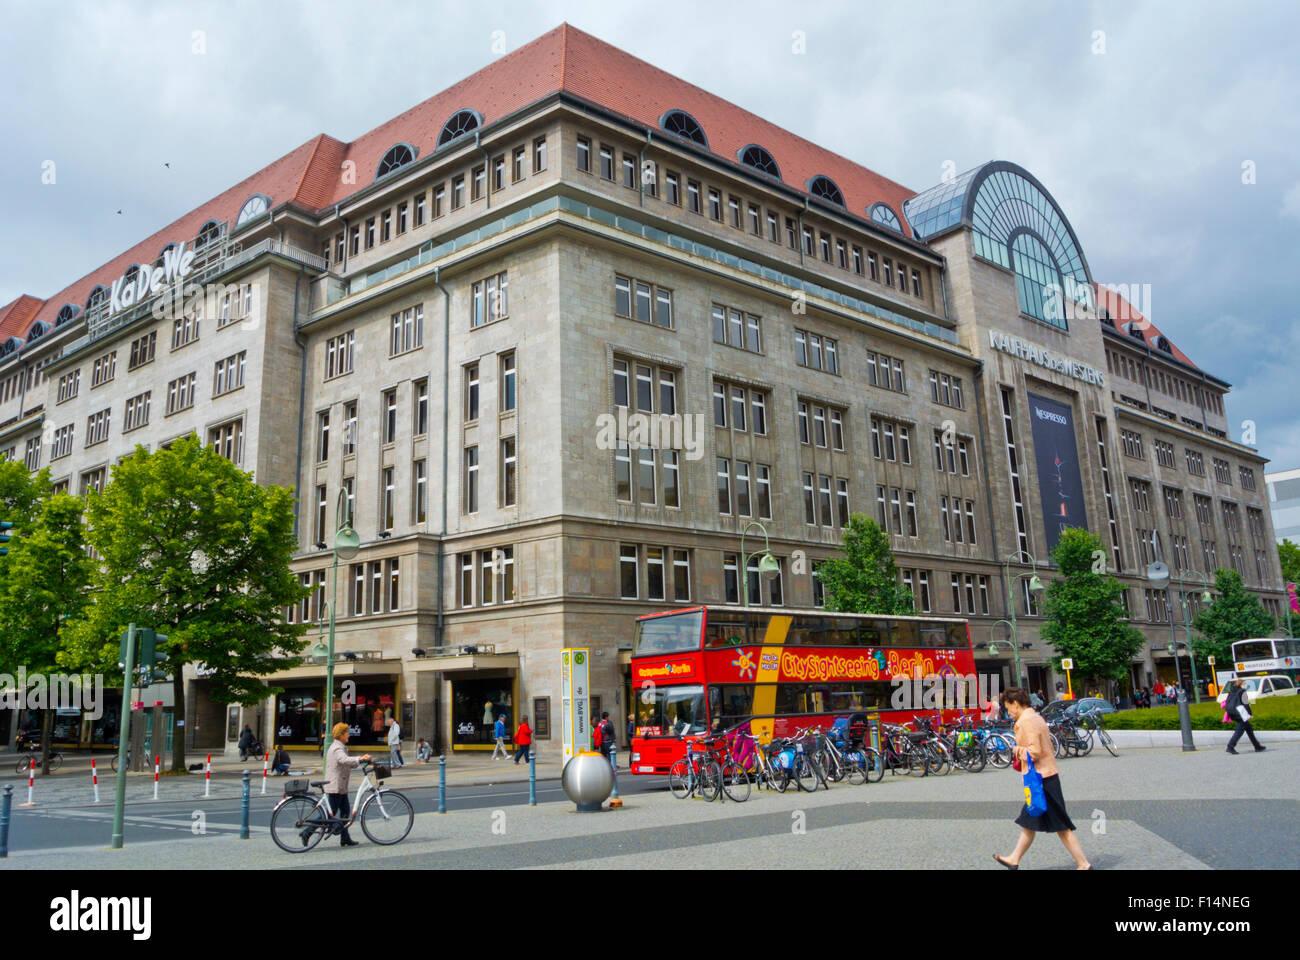 KaDeWe, department store, Wittenbergplatz, west Berlin, Germany - Stock Image